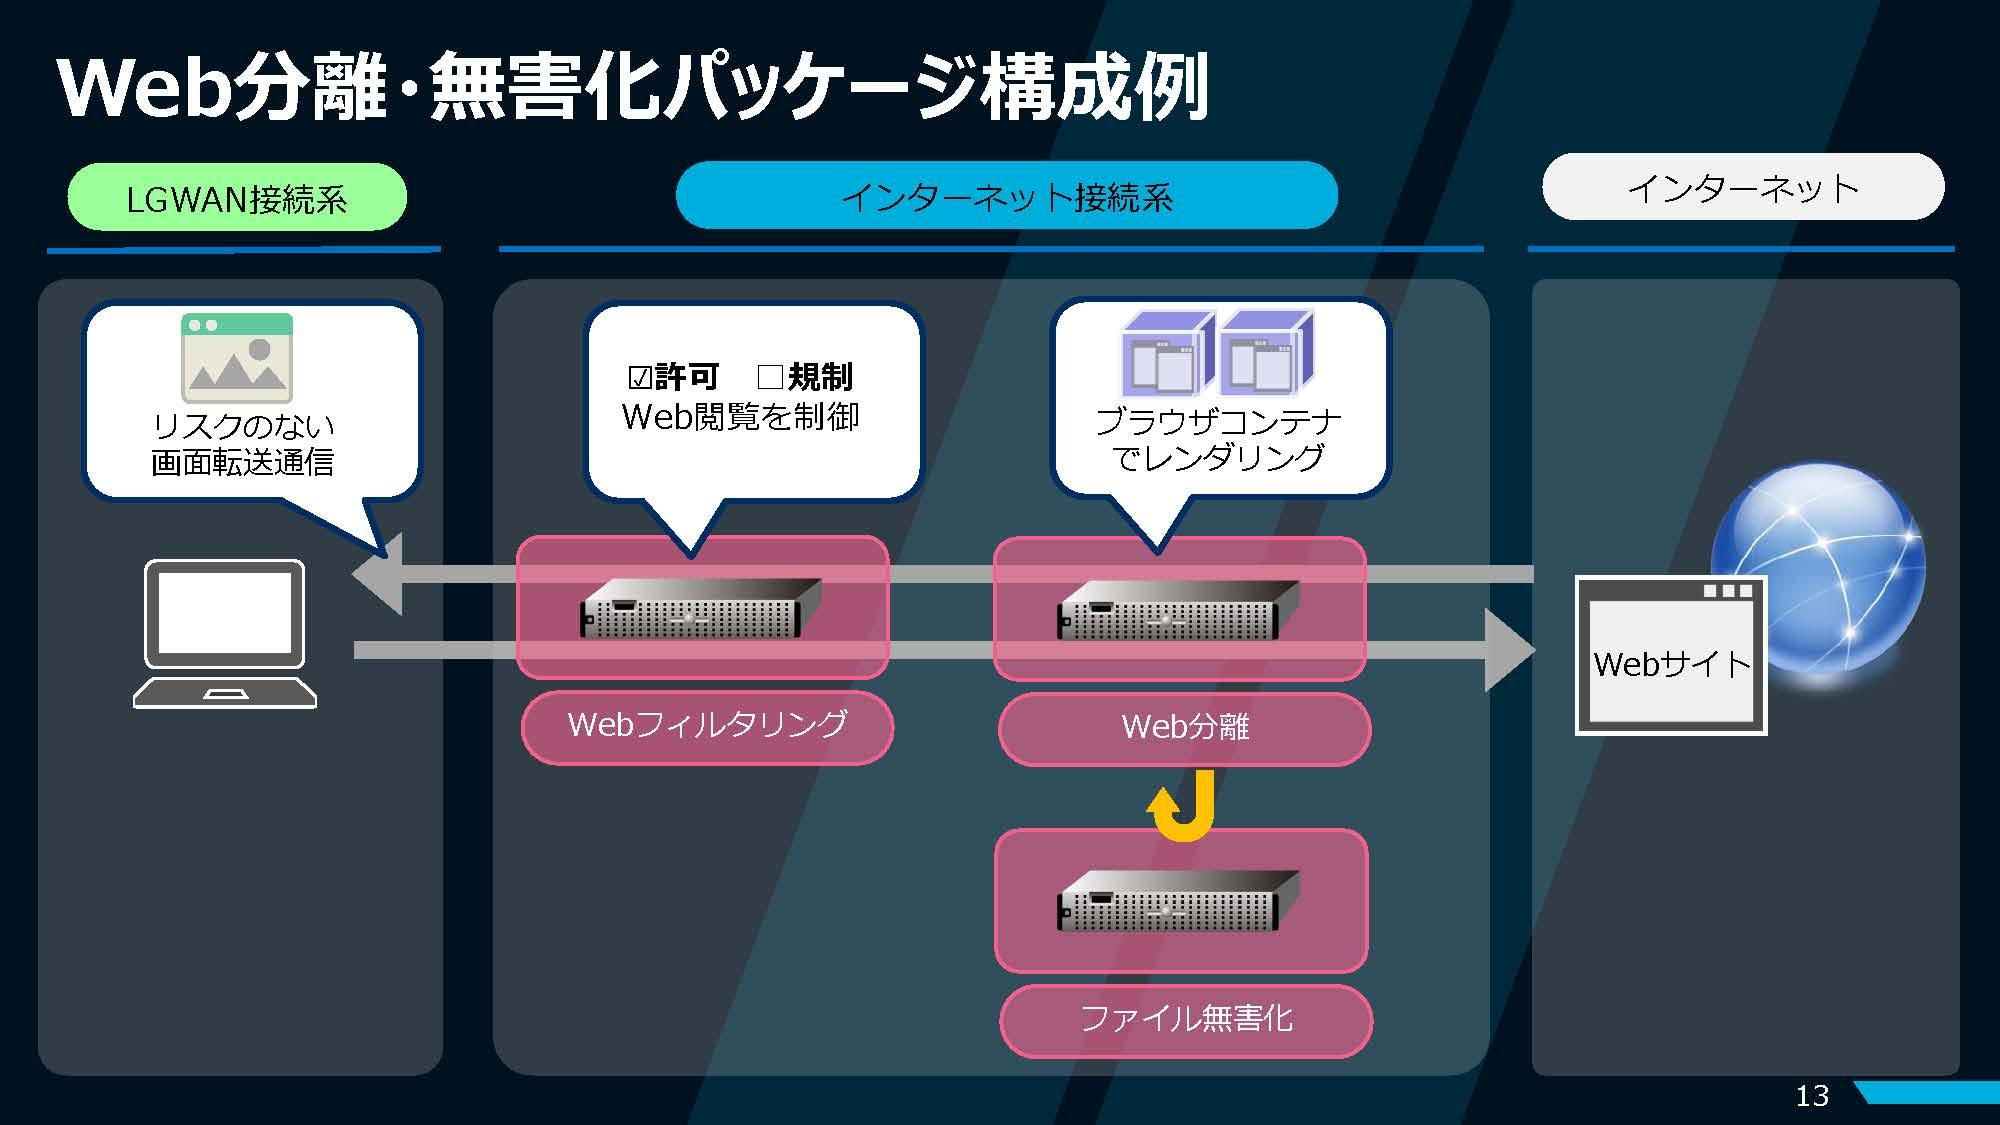 C:\Users\lma-Five\Desktop\オーバル セミレポ\採用画像jpg\6-13.jpg